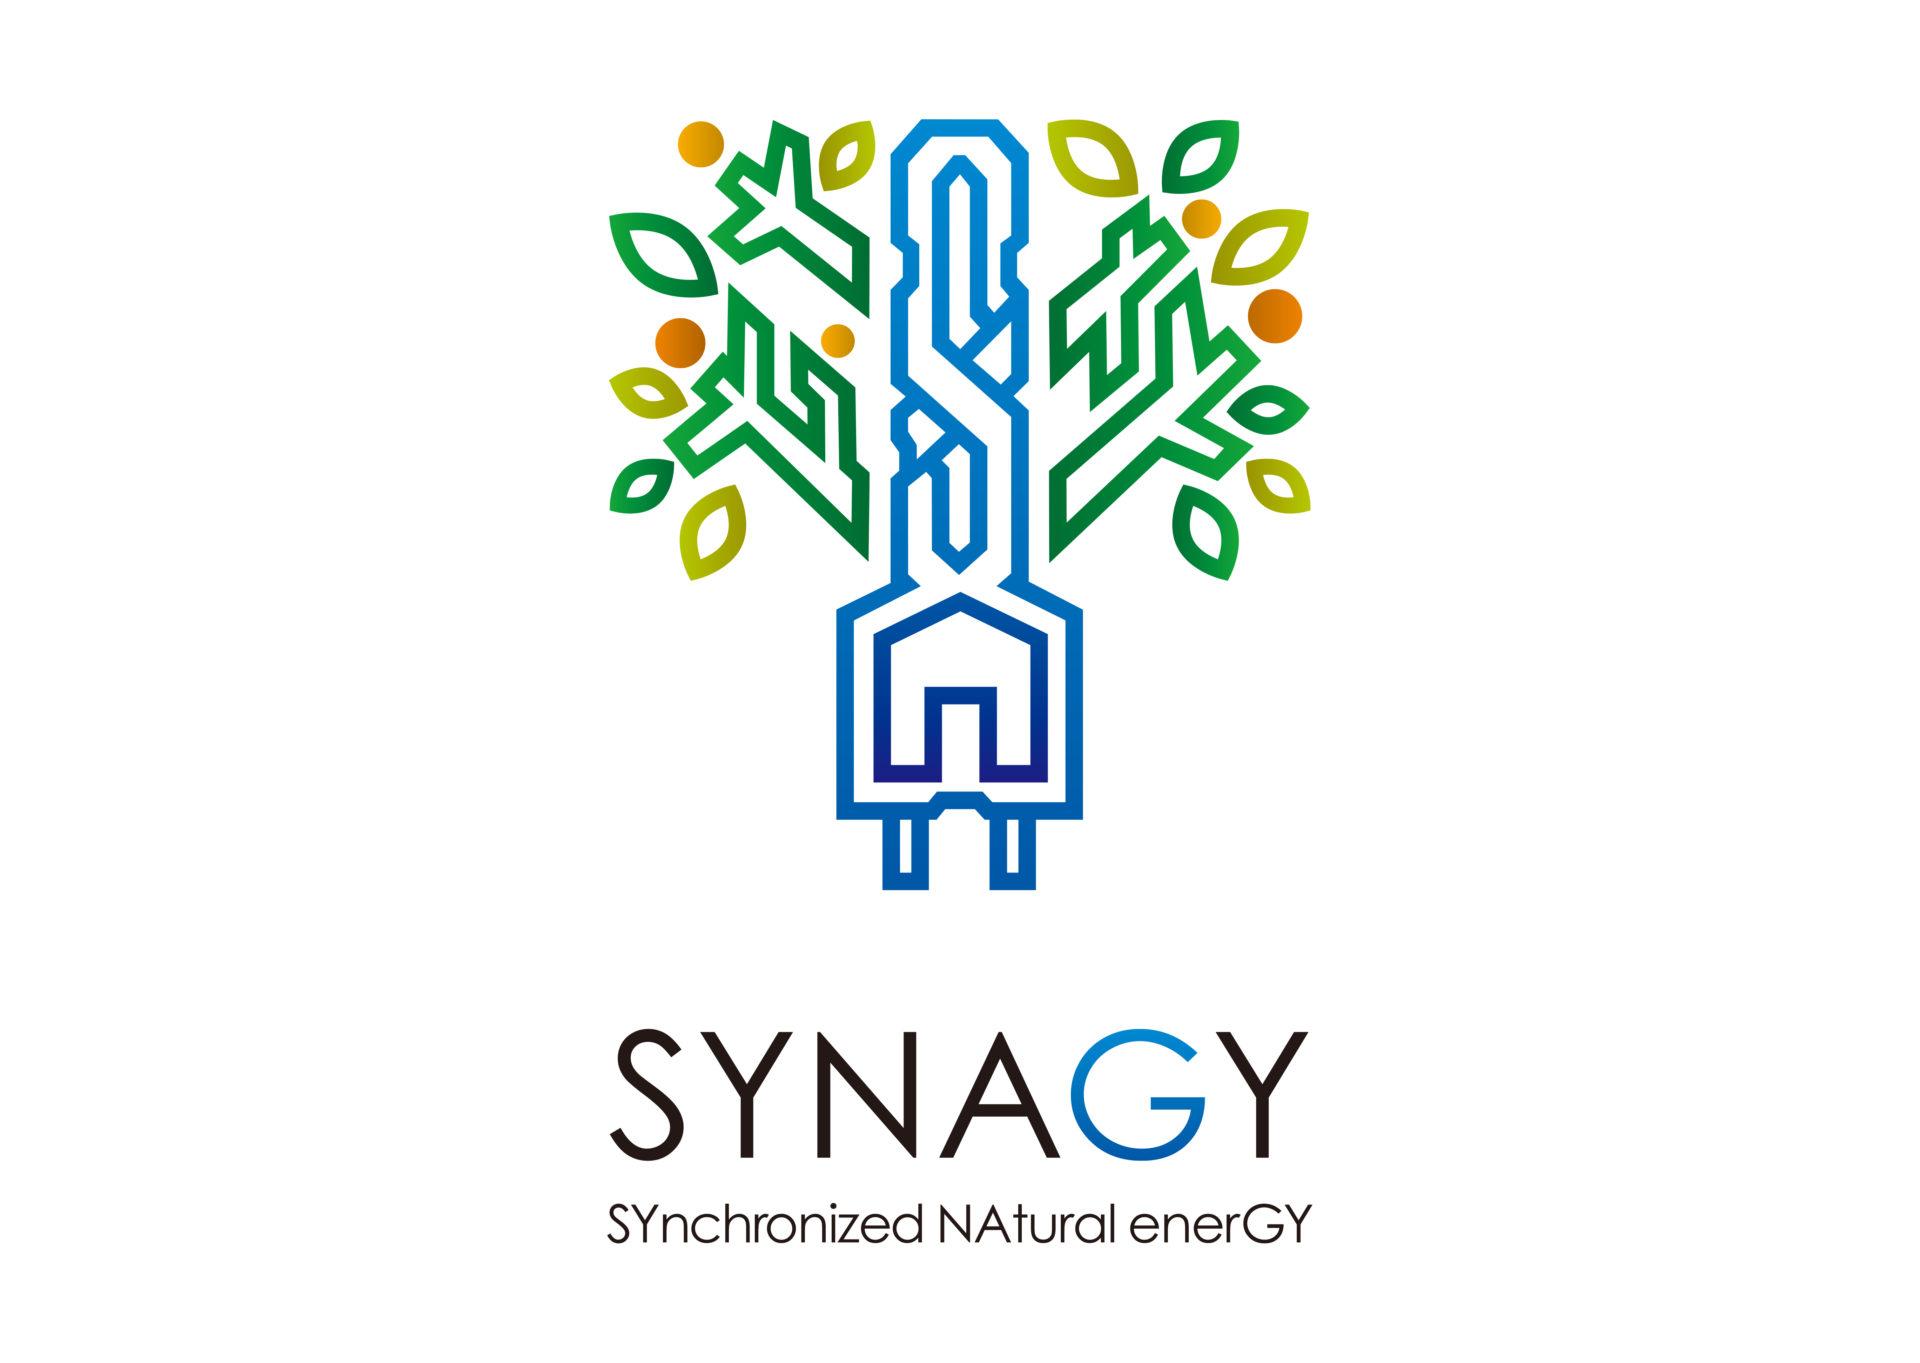 SYNAGY トランスパシフィックPowers株式会社 ロゴ